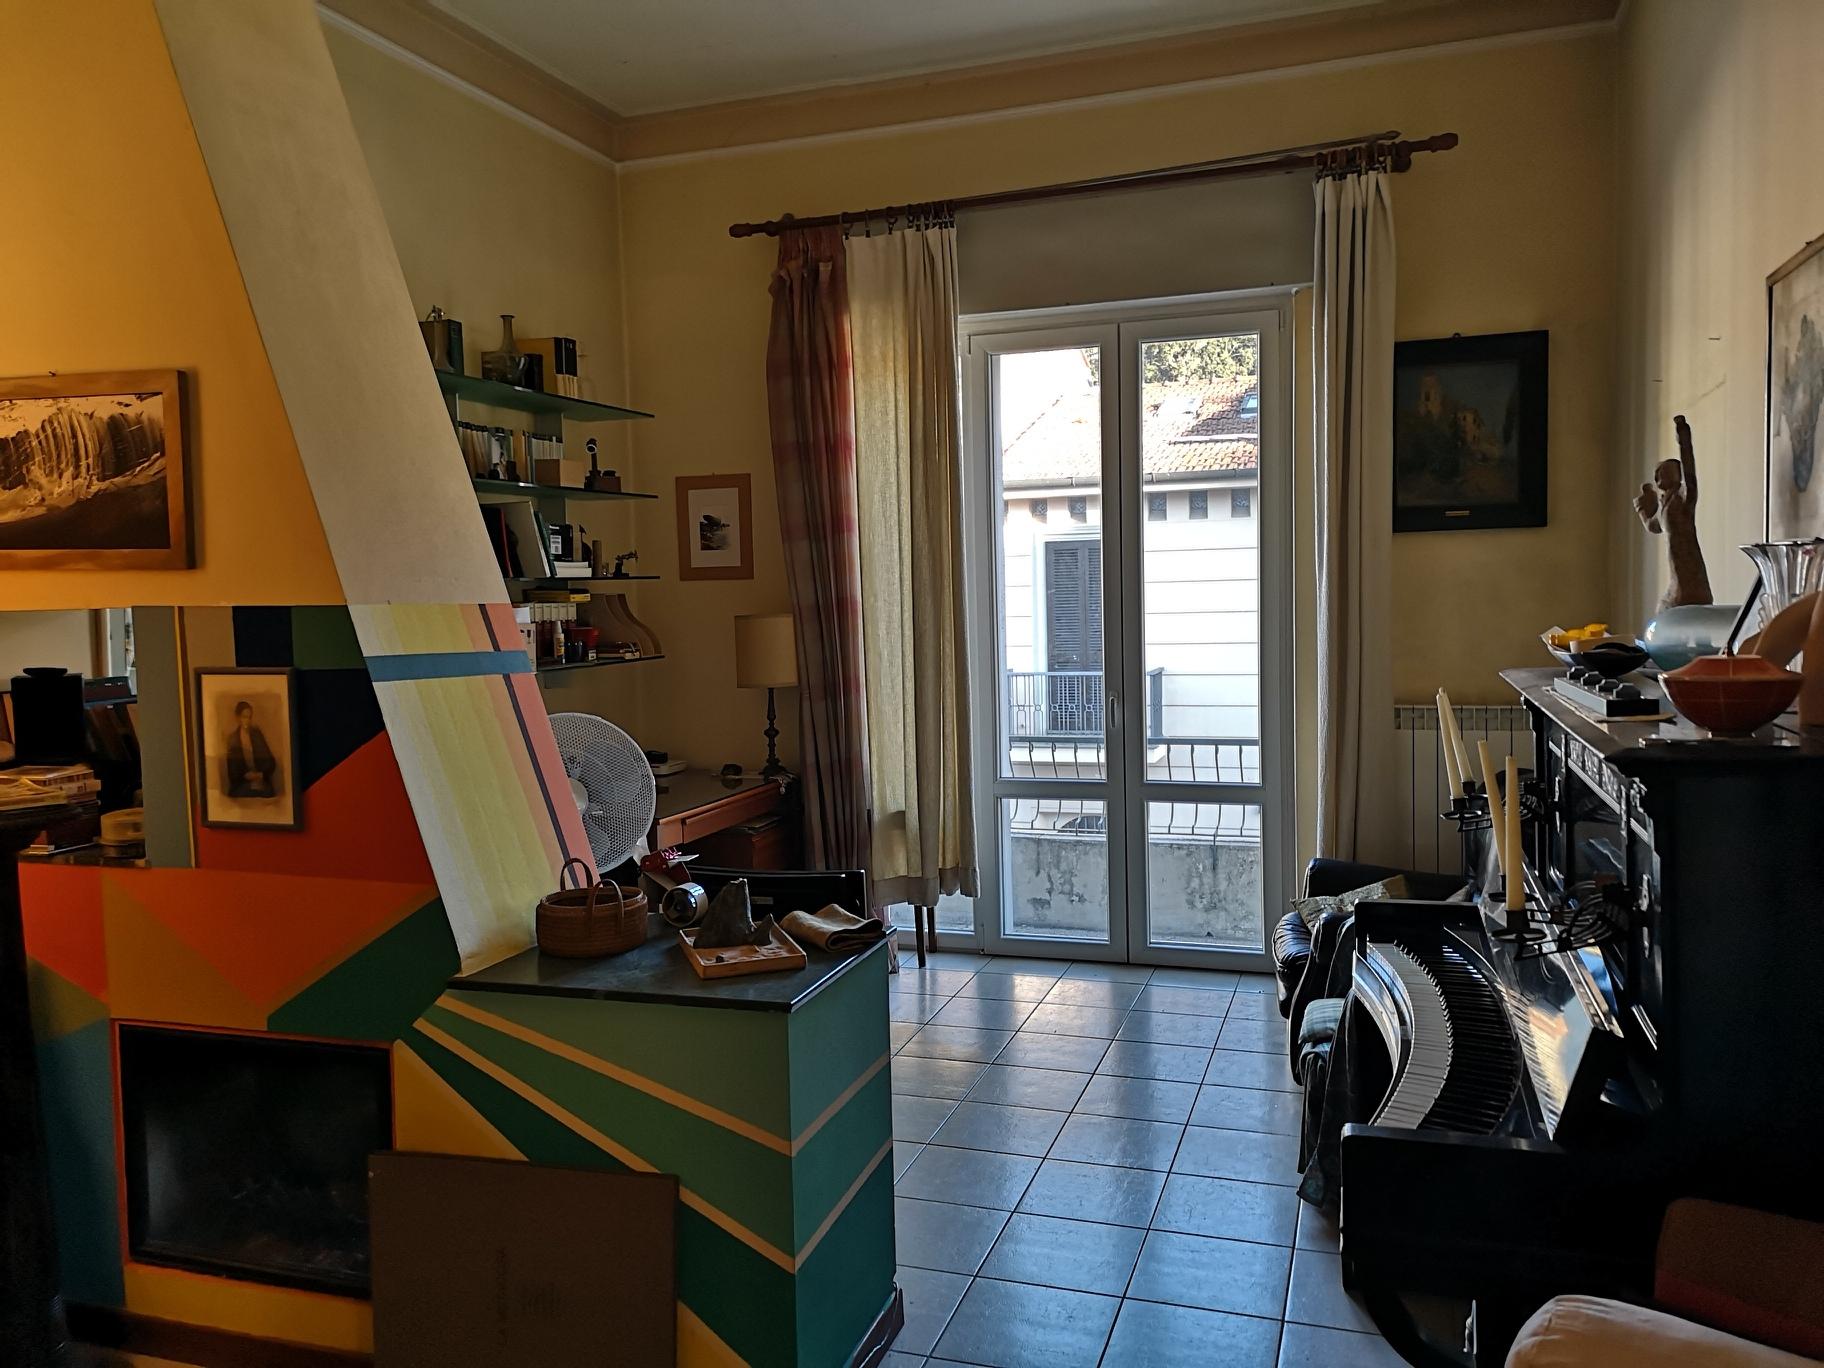 viareggio vendita quart: darsena mediterranea immobiliare s.n.c.